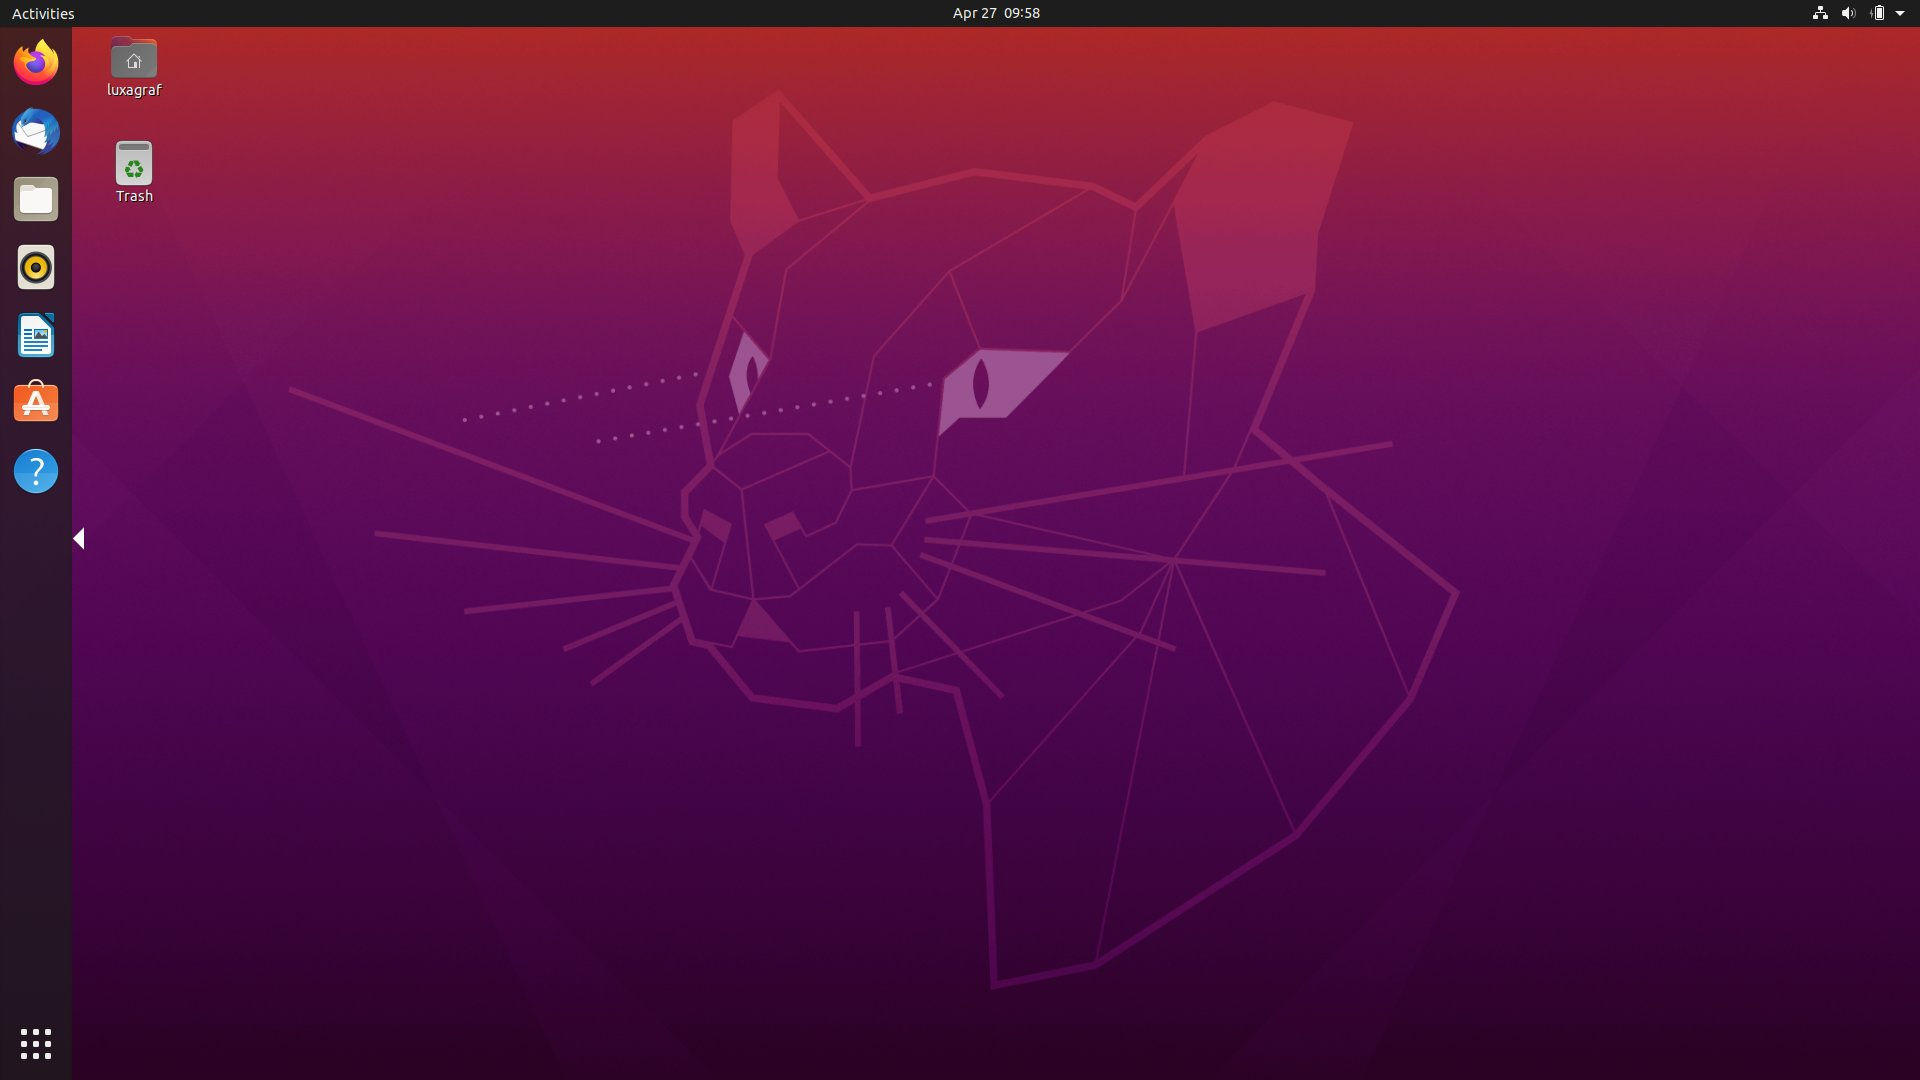 Change Login Screen Background In Ubuntu 20.04 LTS